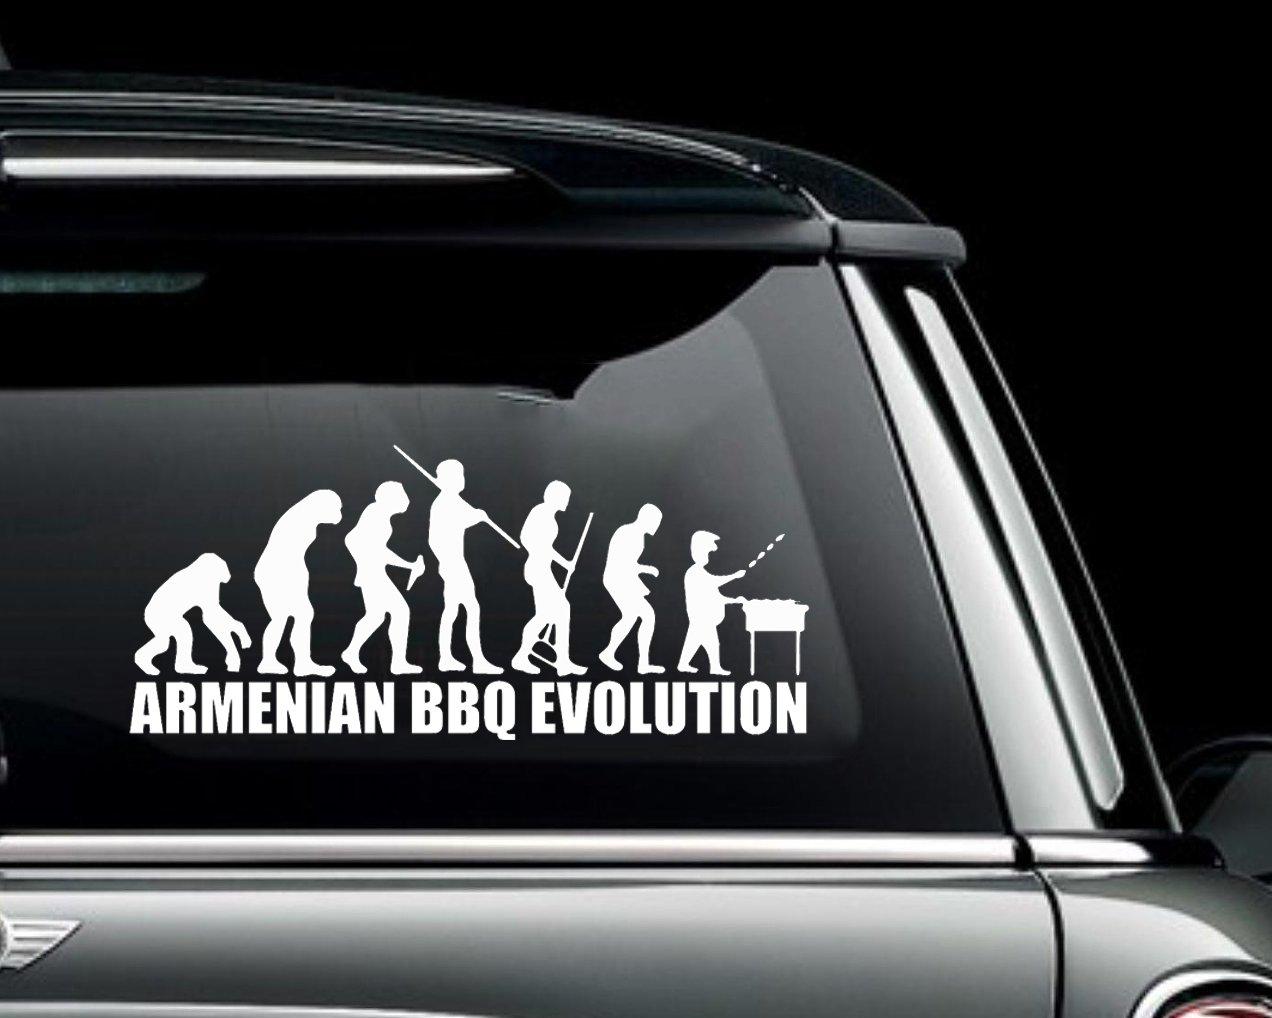 Armenia Flag Vinyl Decal Bumper Sticker 2-Pack Car Truck Van Laptop Window